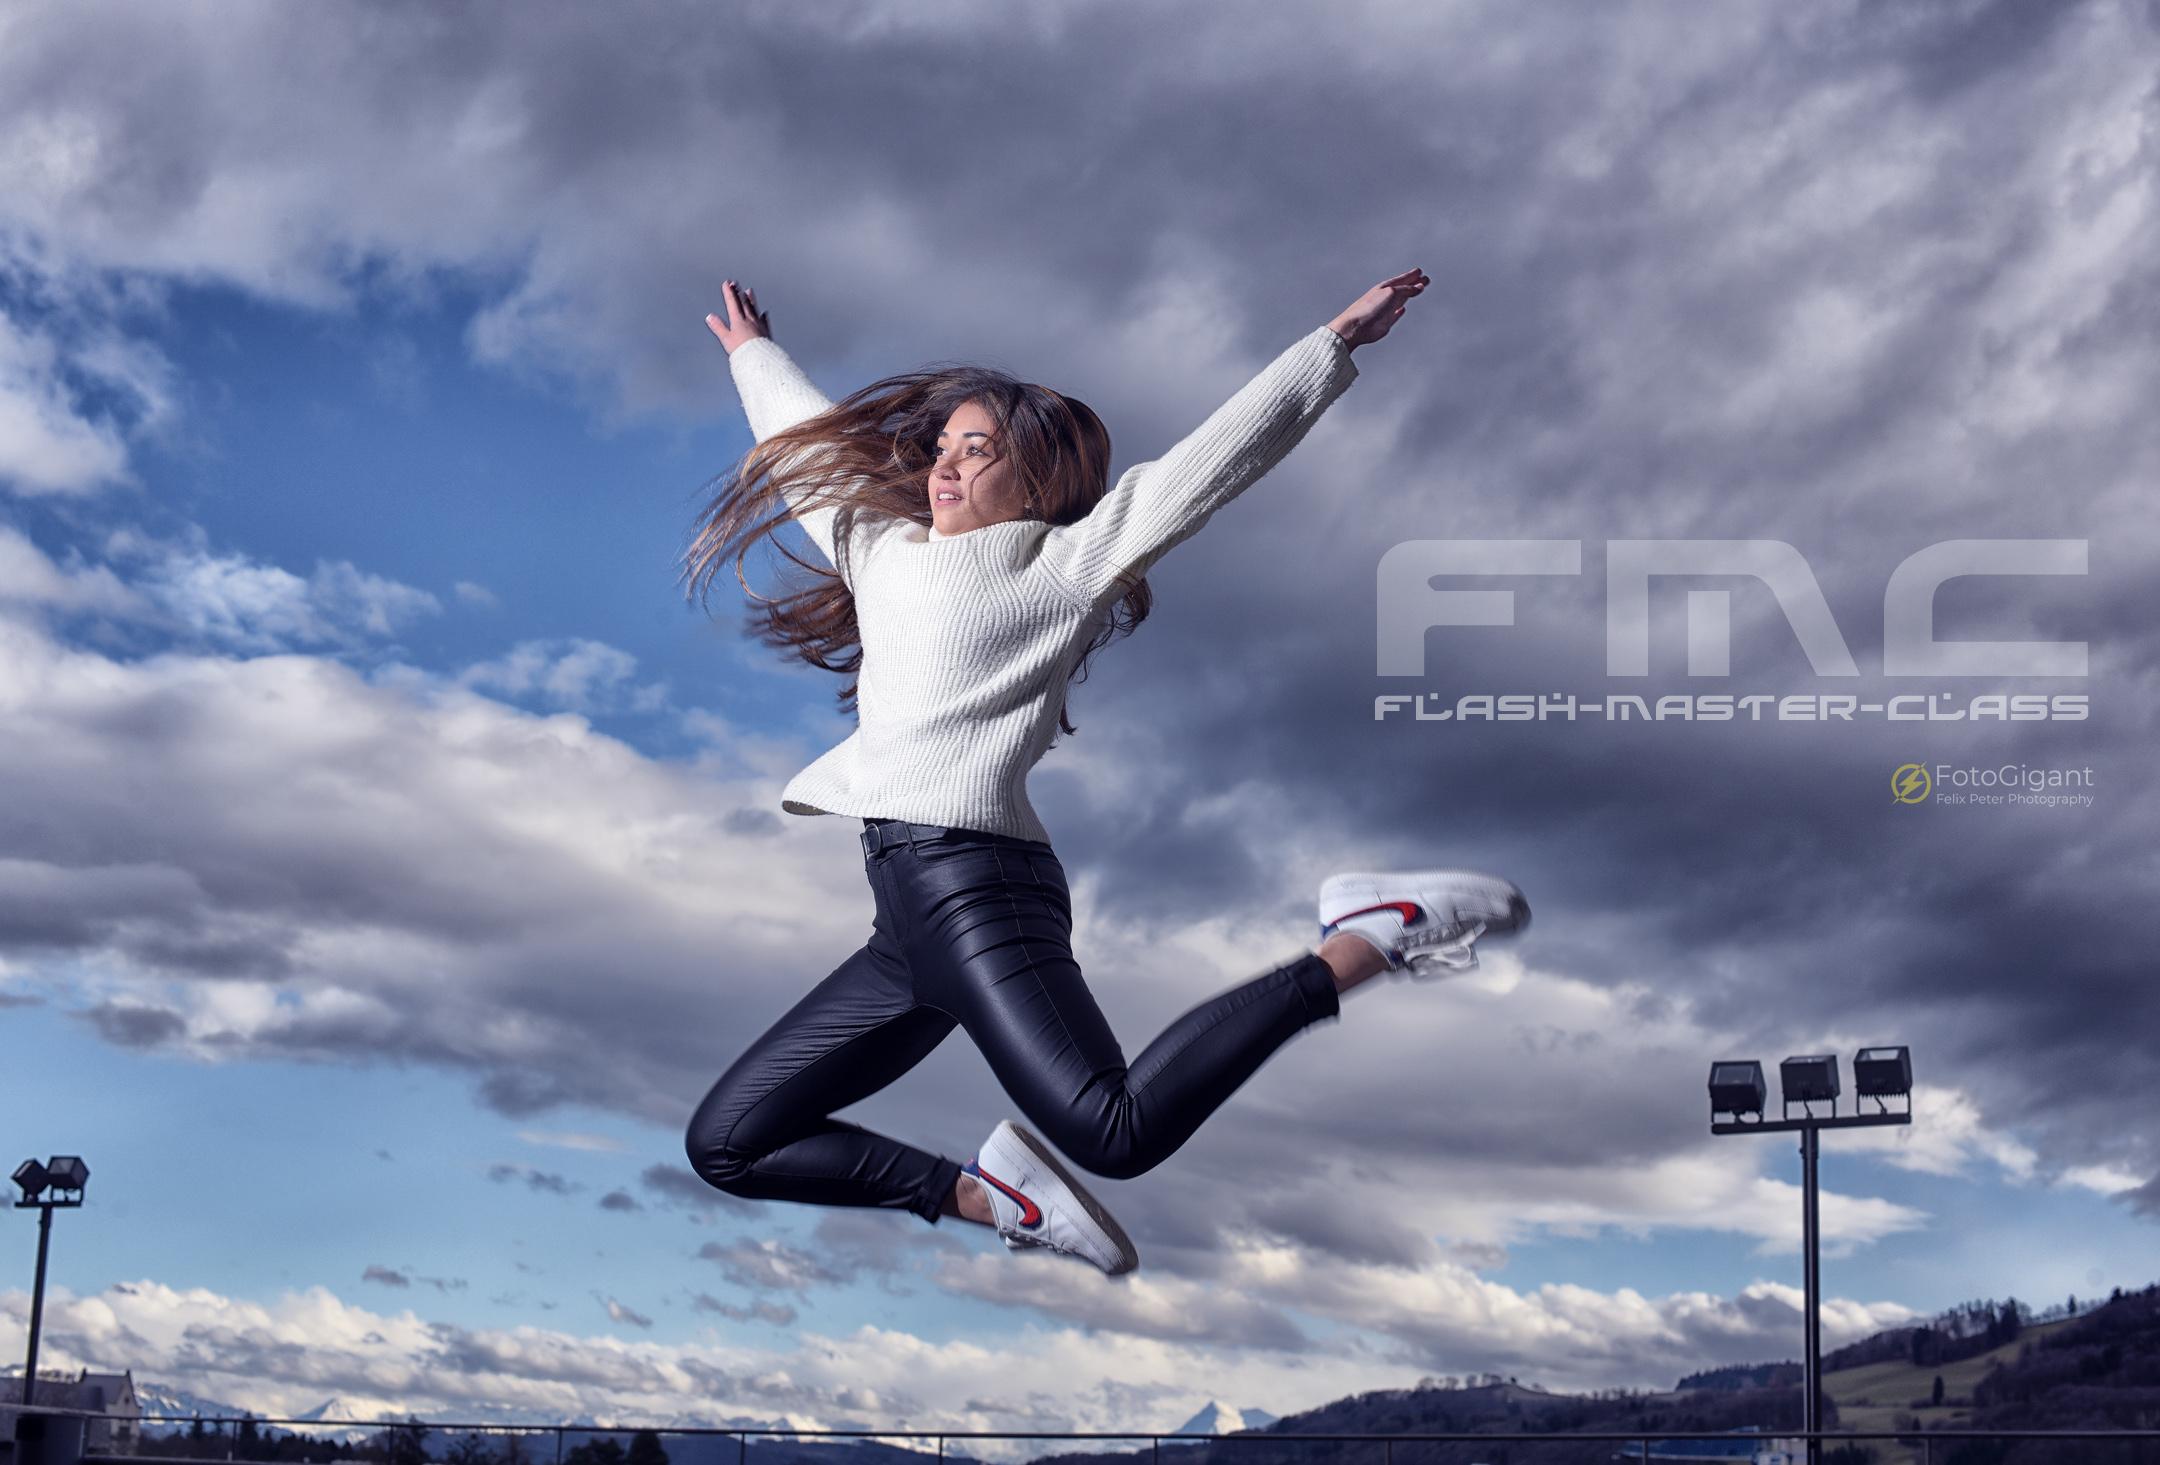 Flash-Masterclass_Fotokurs_13.jpg